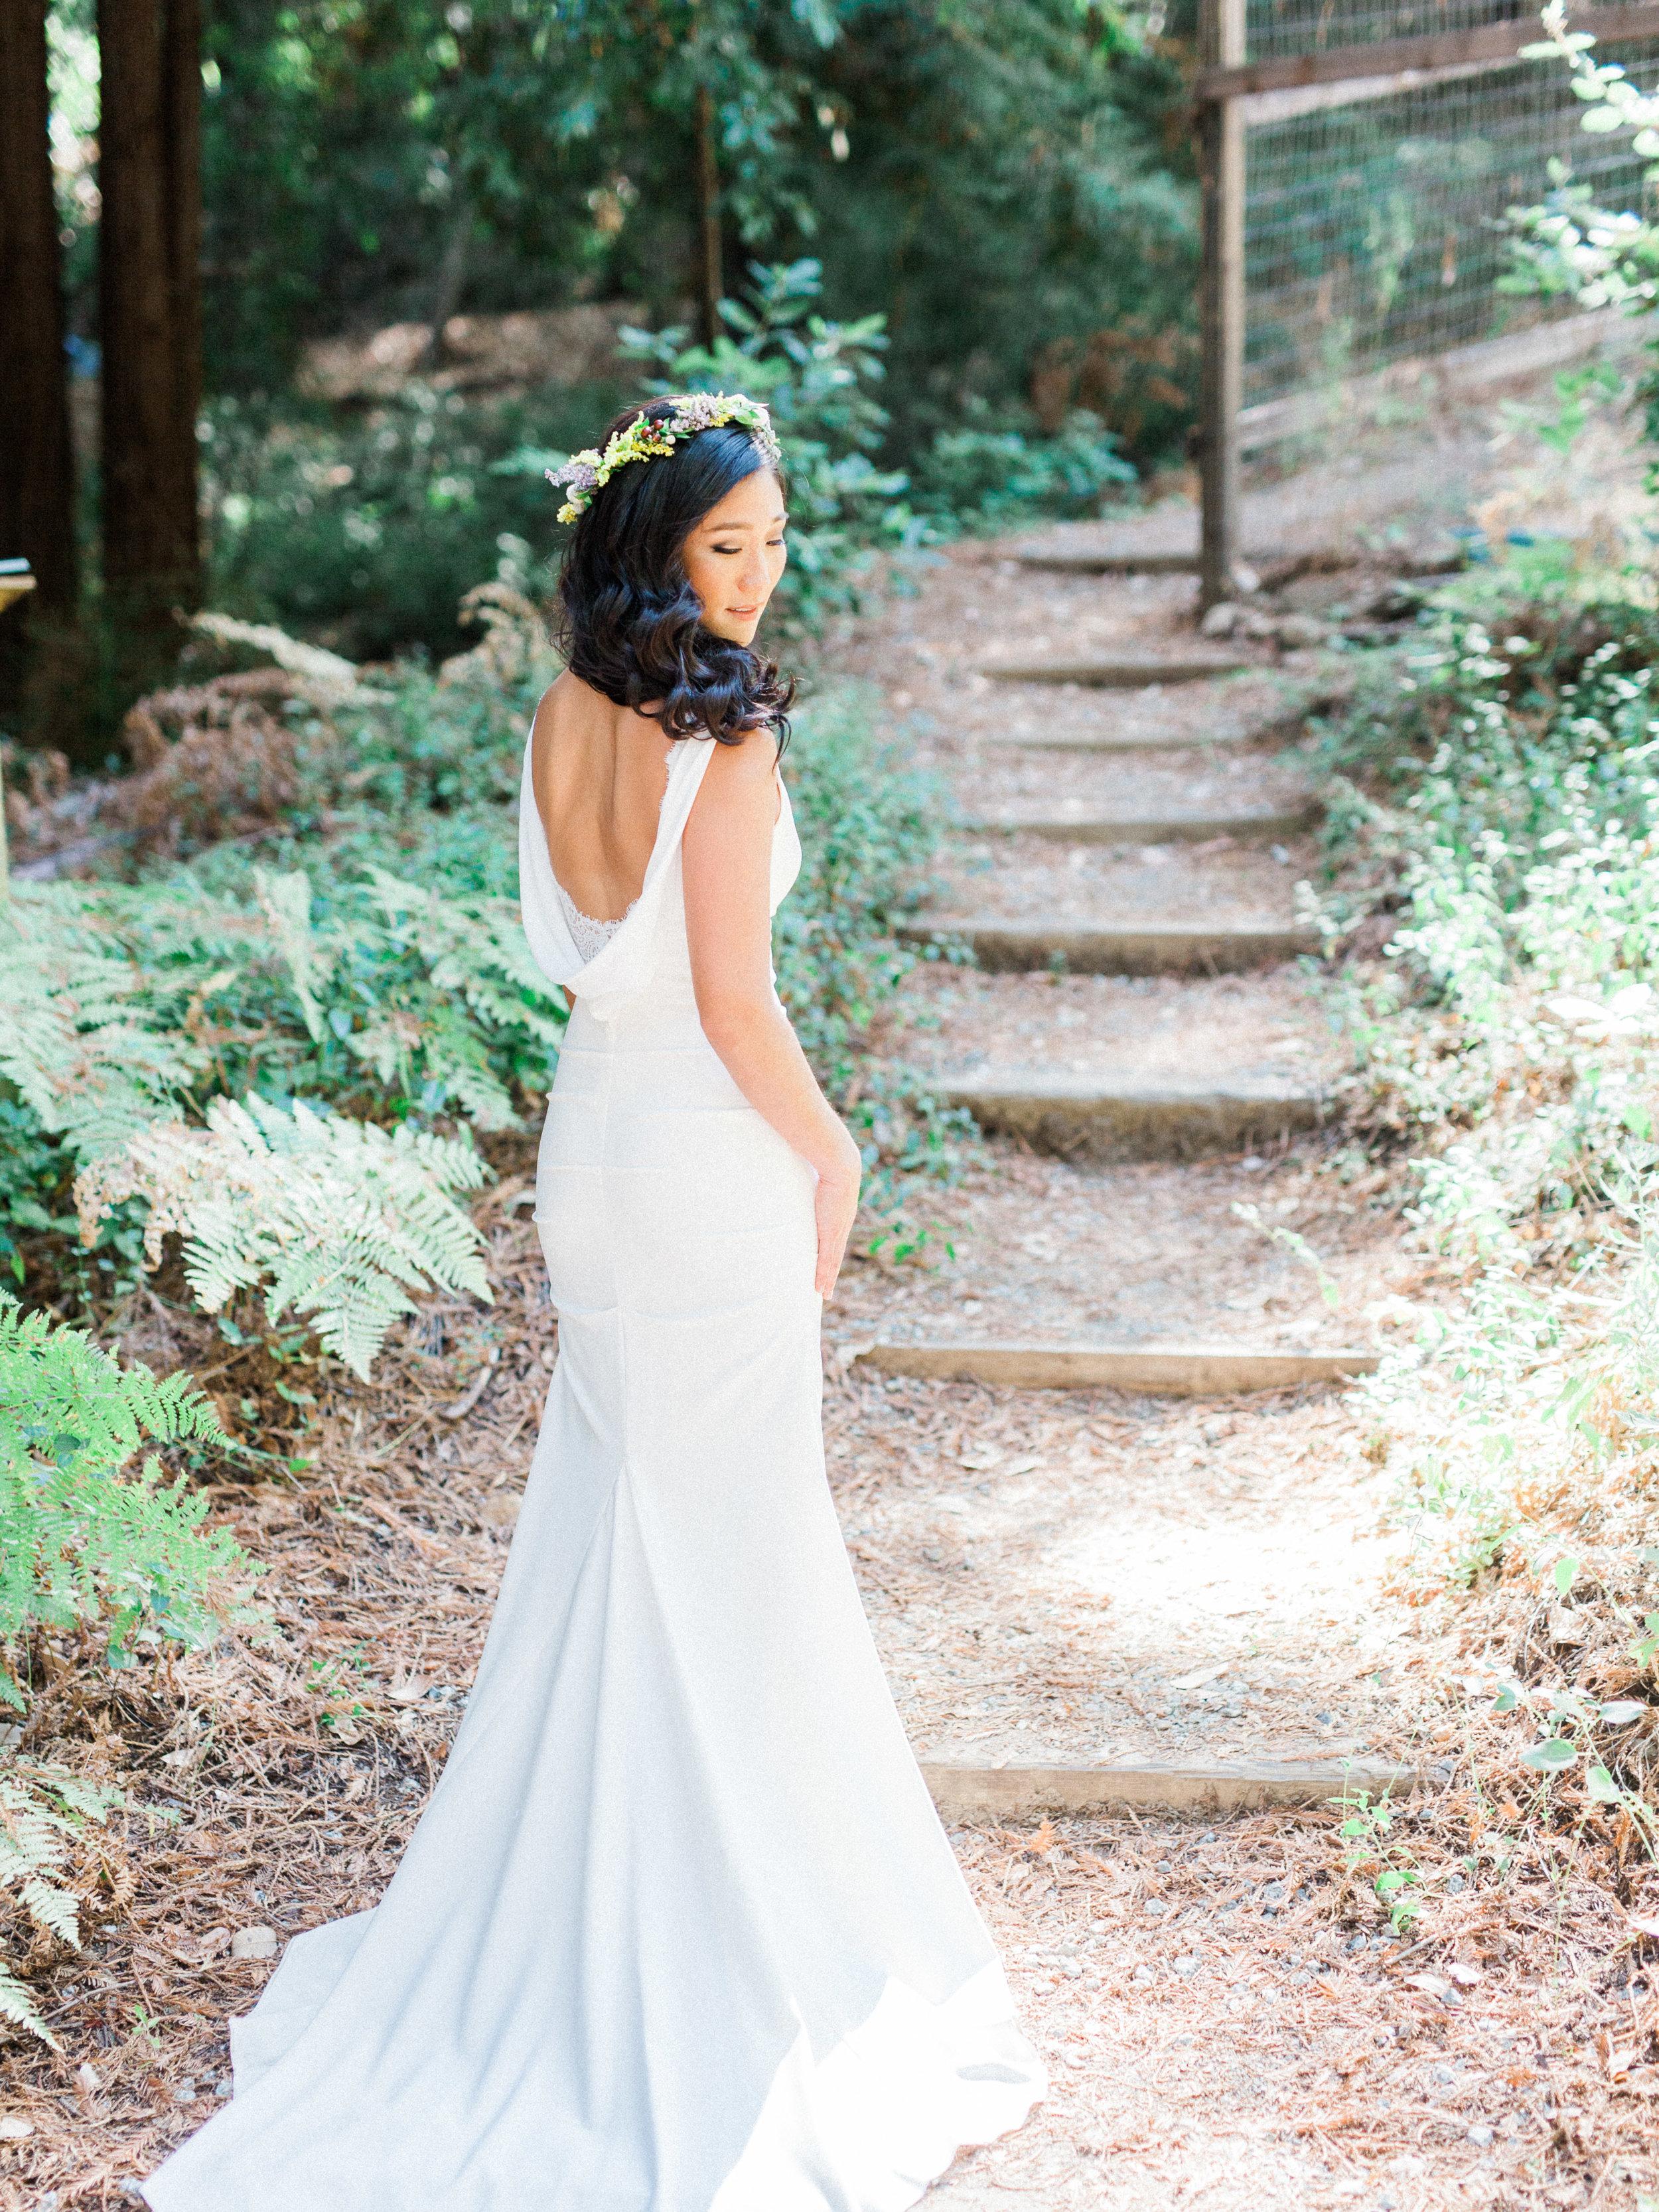 Sequoia Retreat Center, Ben Lomand Wedding